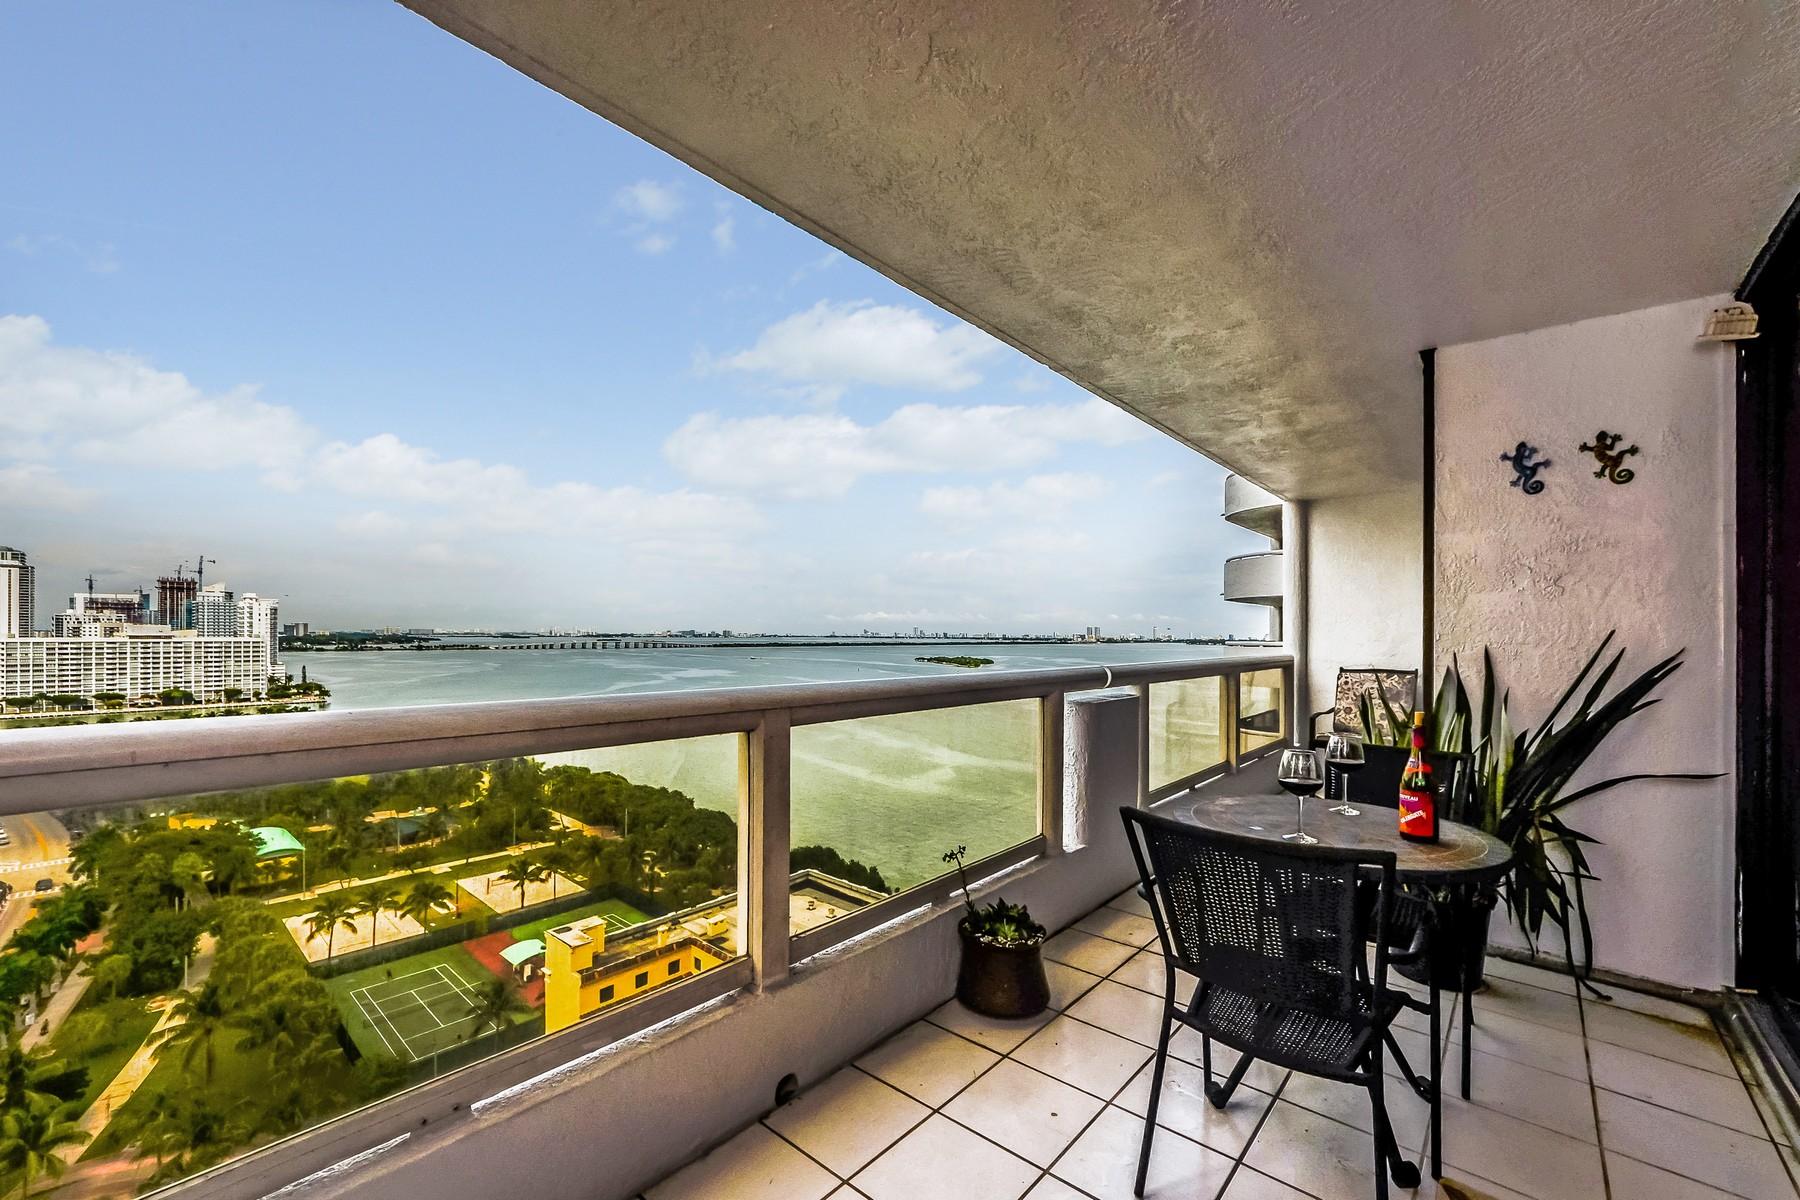 Condominium for Sale at 1717 N Bayshore Dr #A-2040 1717 N Bayshore Dr, #A-2040 Miami, Florida 33132 United States